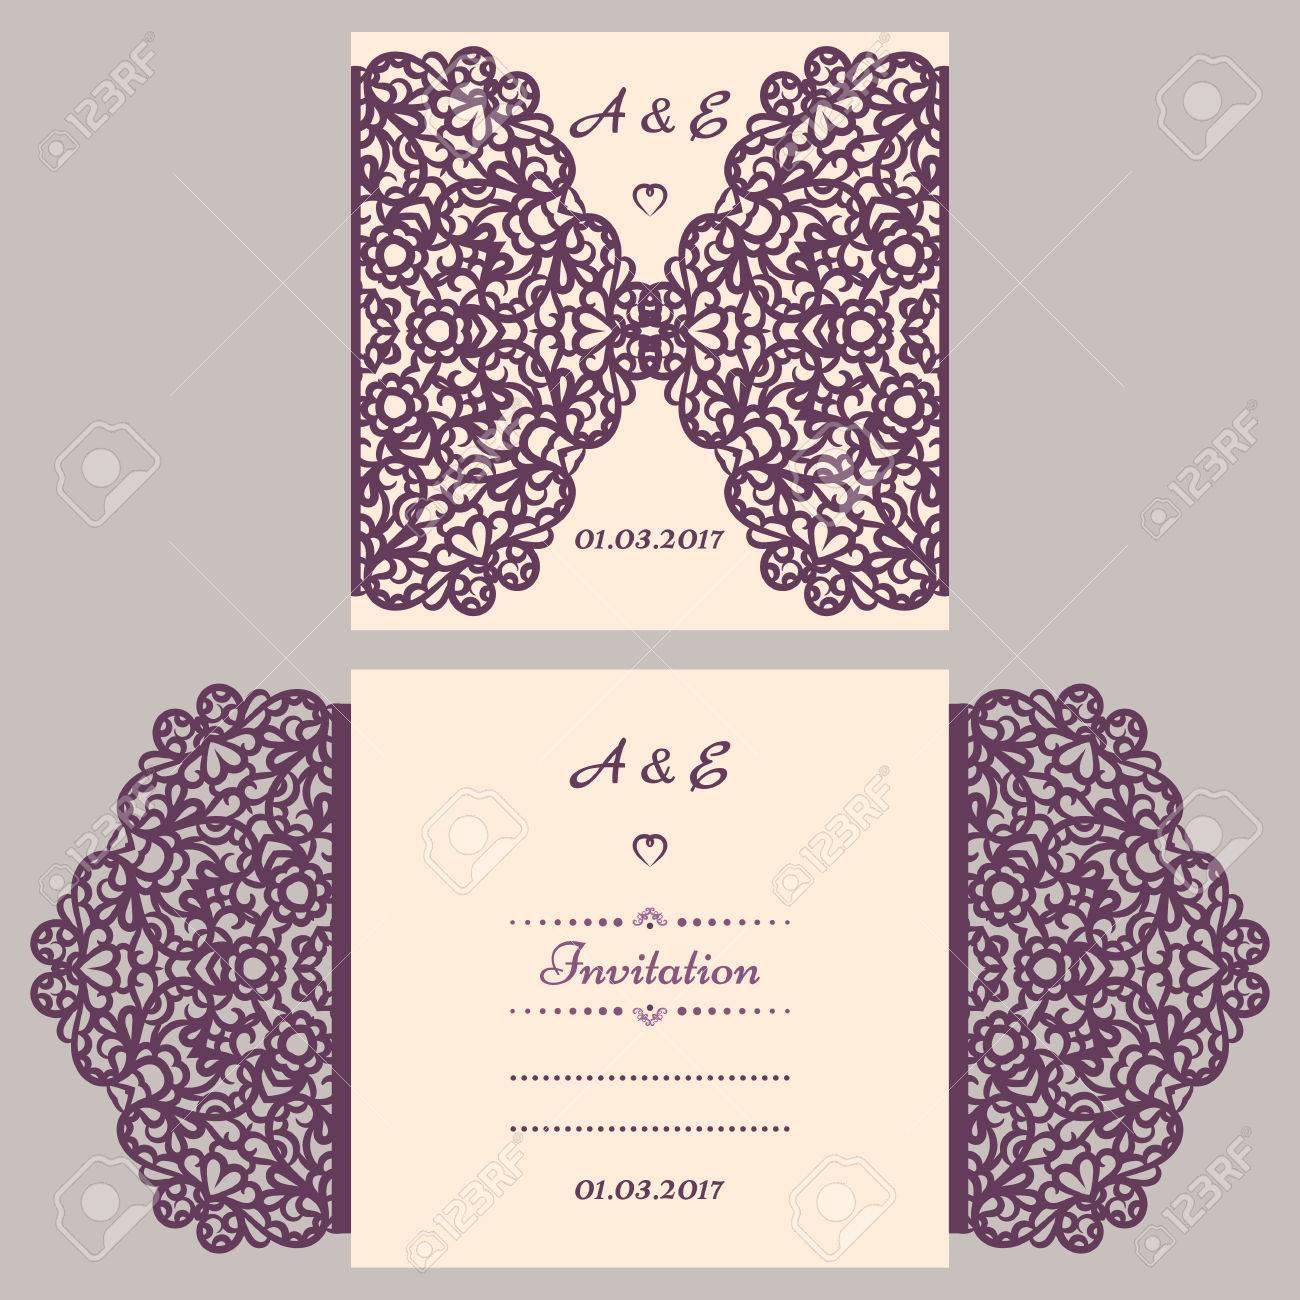 wedding invitation envelope designs